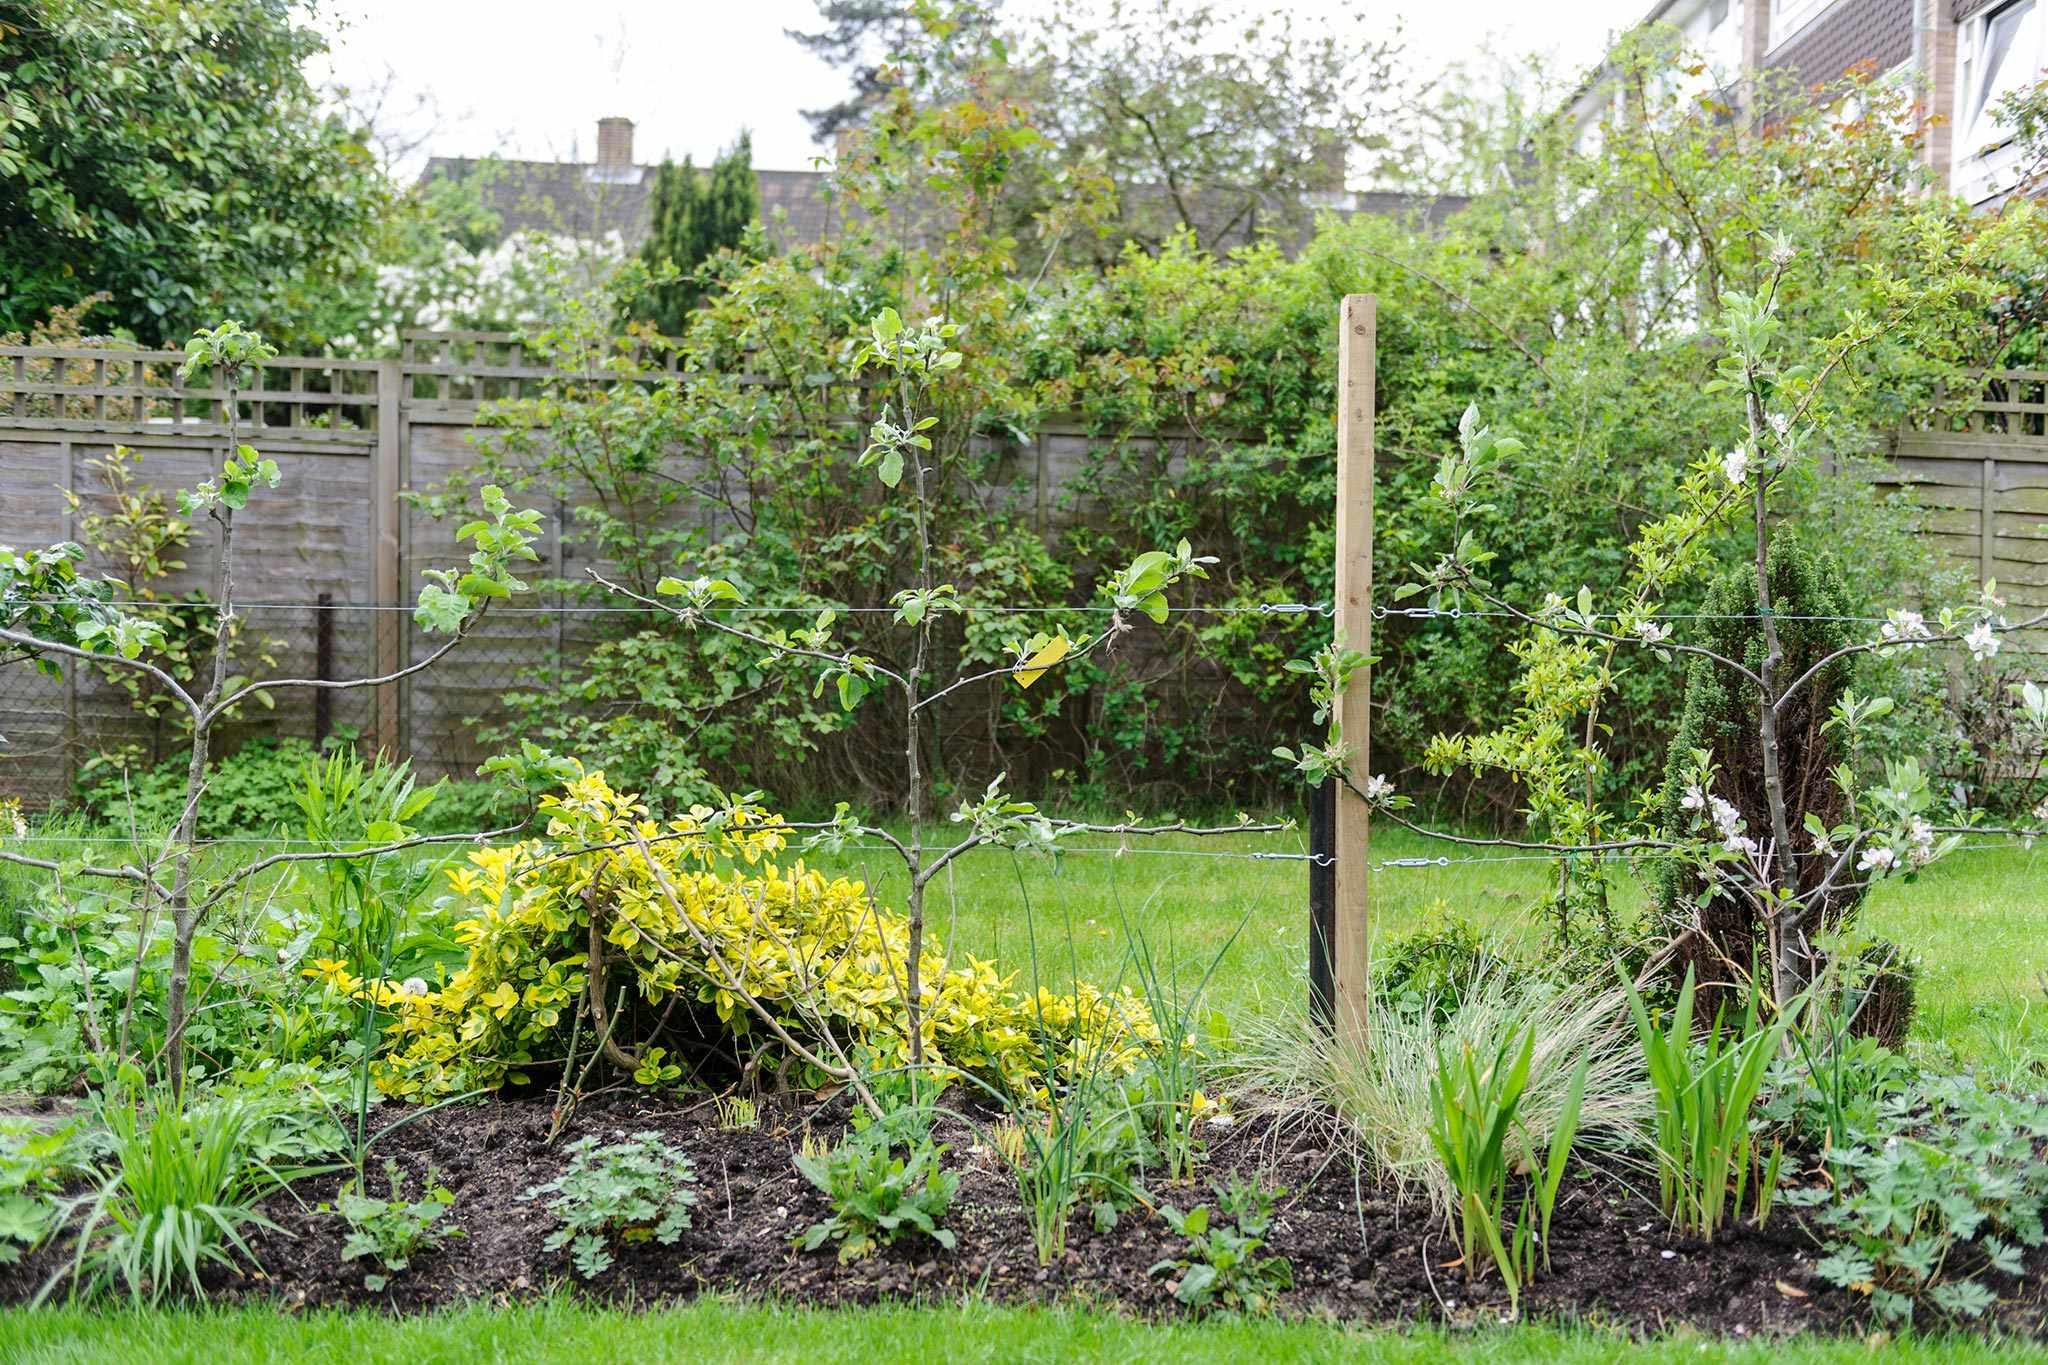 A row of espalier fruit trees